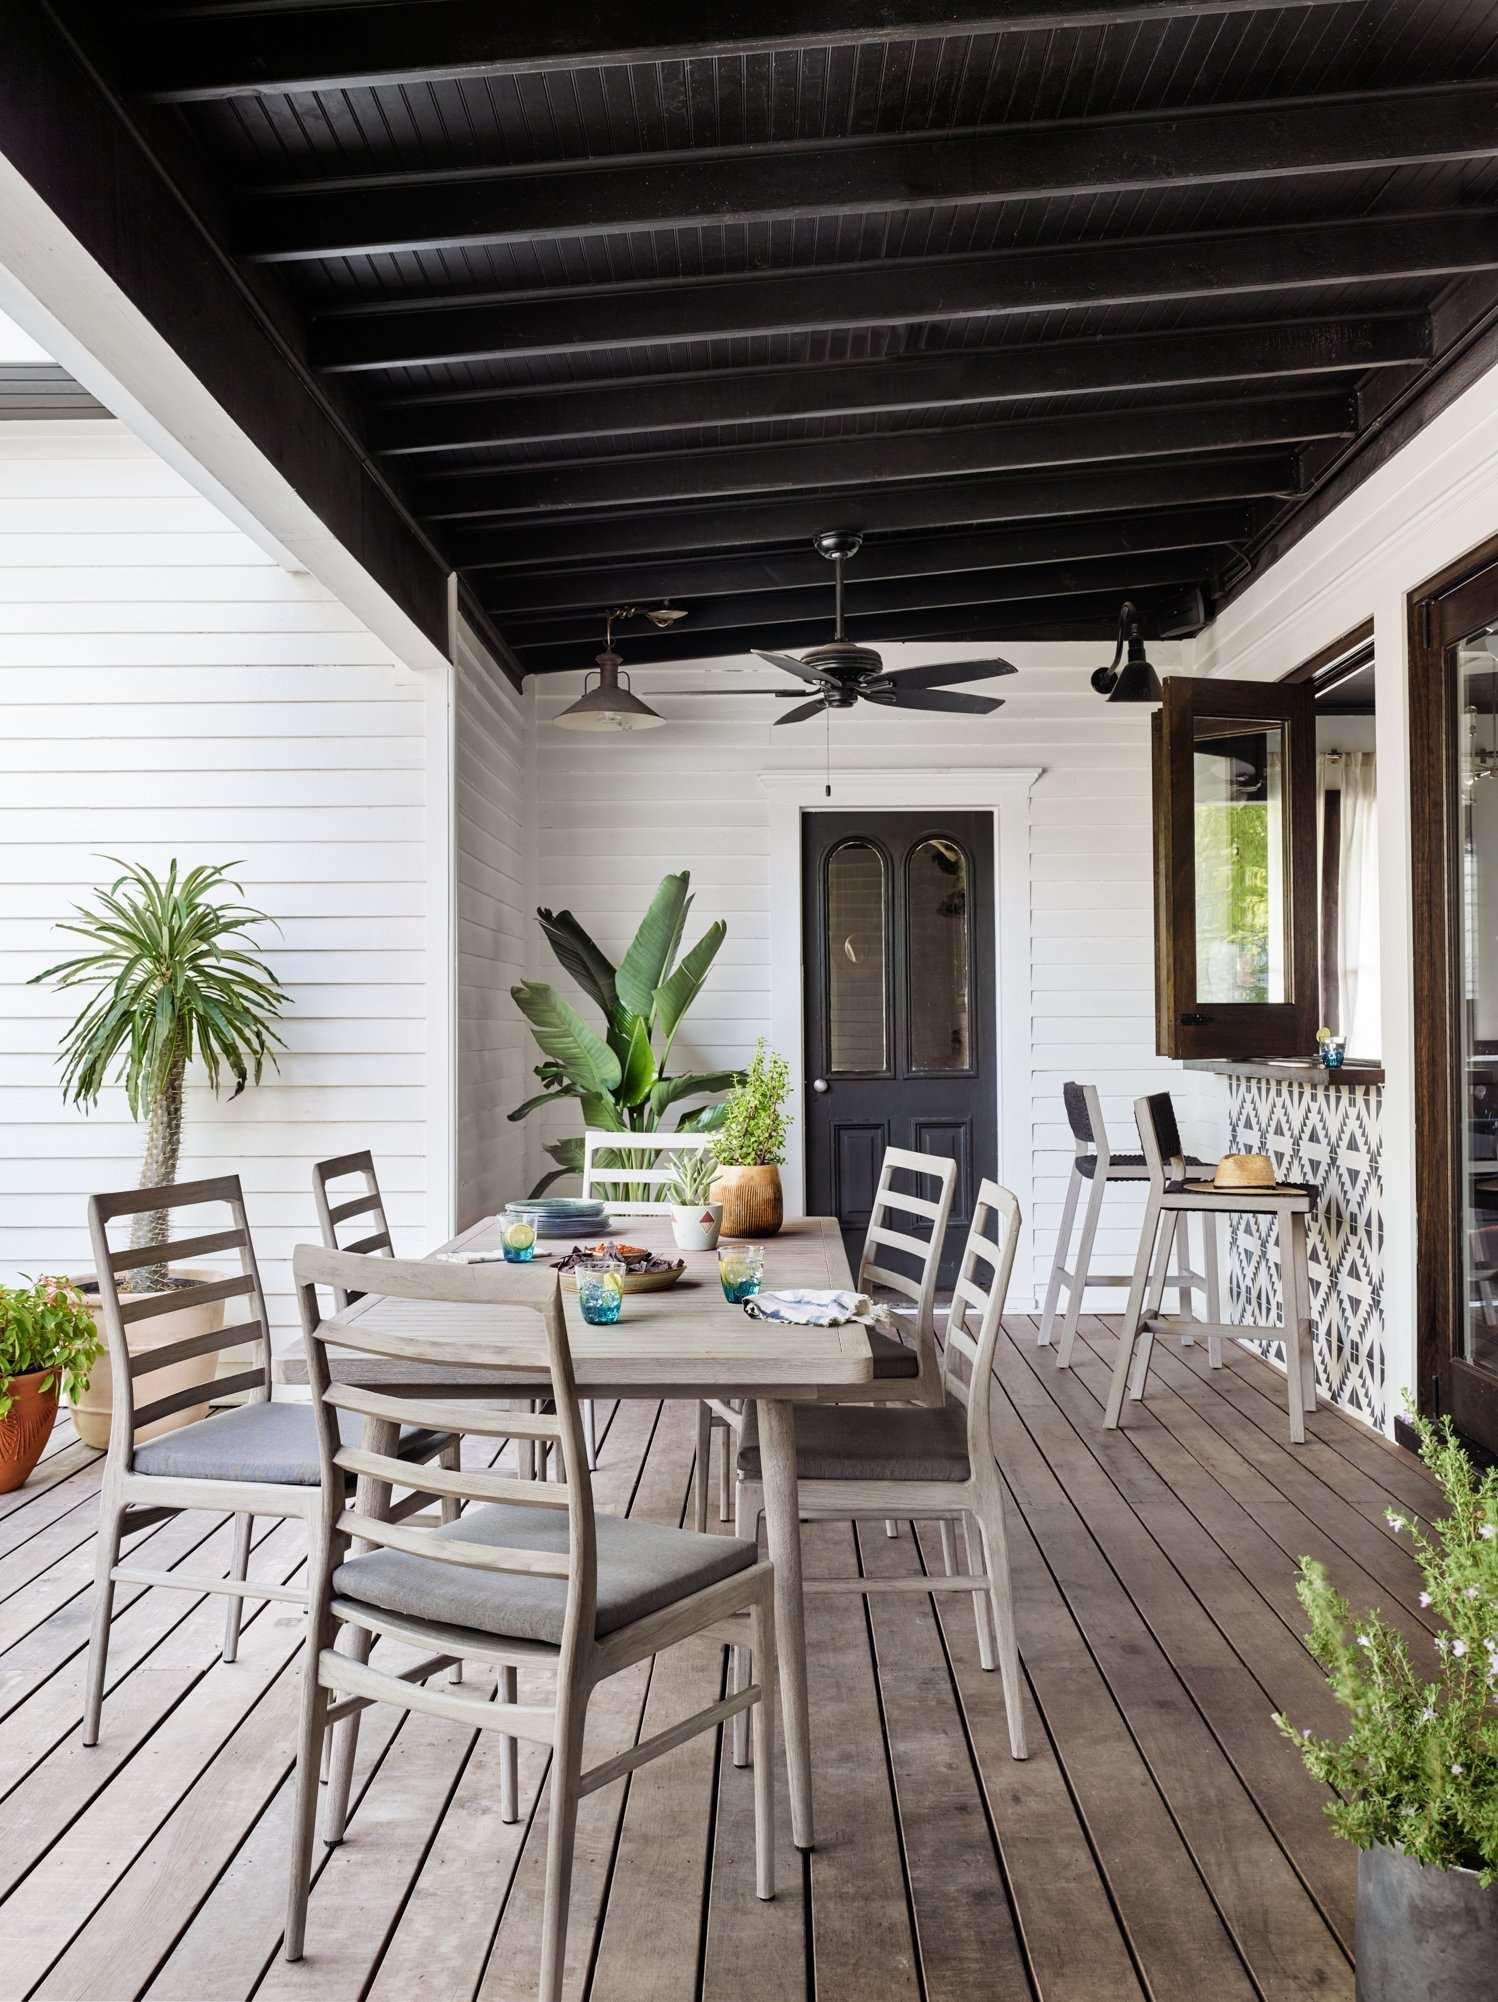 delano outdoor bar stool-grey